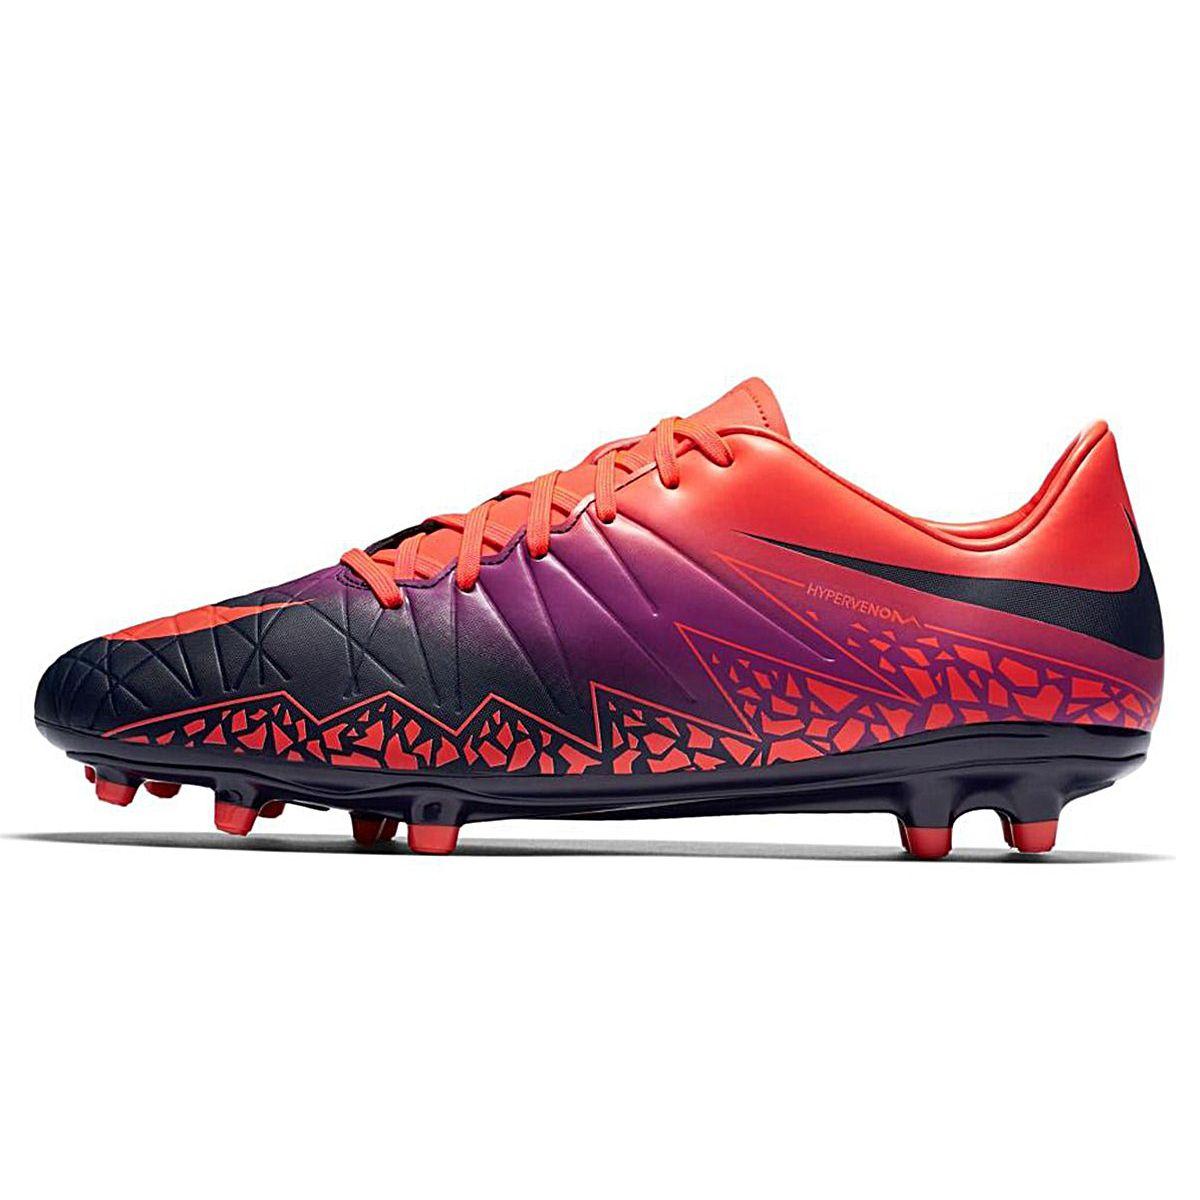 Espesar peso Ciudad Menda  Nike Hypervenom Phelon Ii Fg Krampon 749896845 - Futbol Ayakkabıları